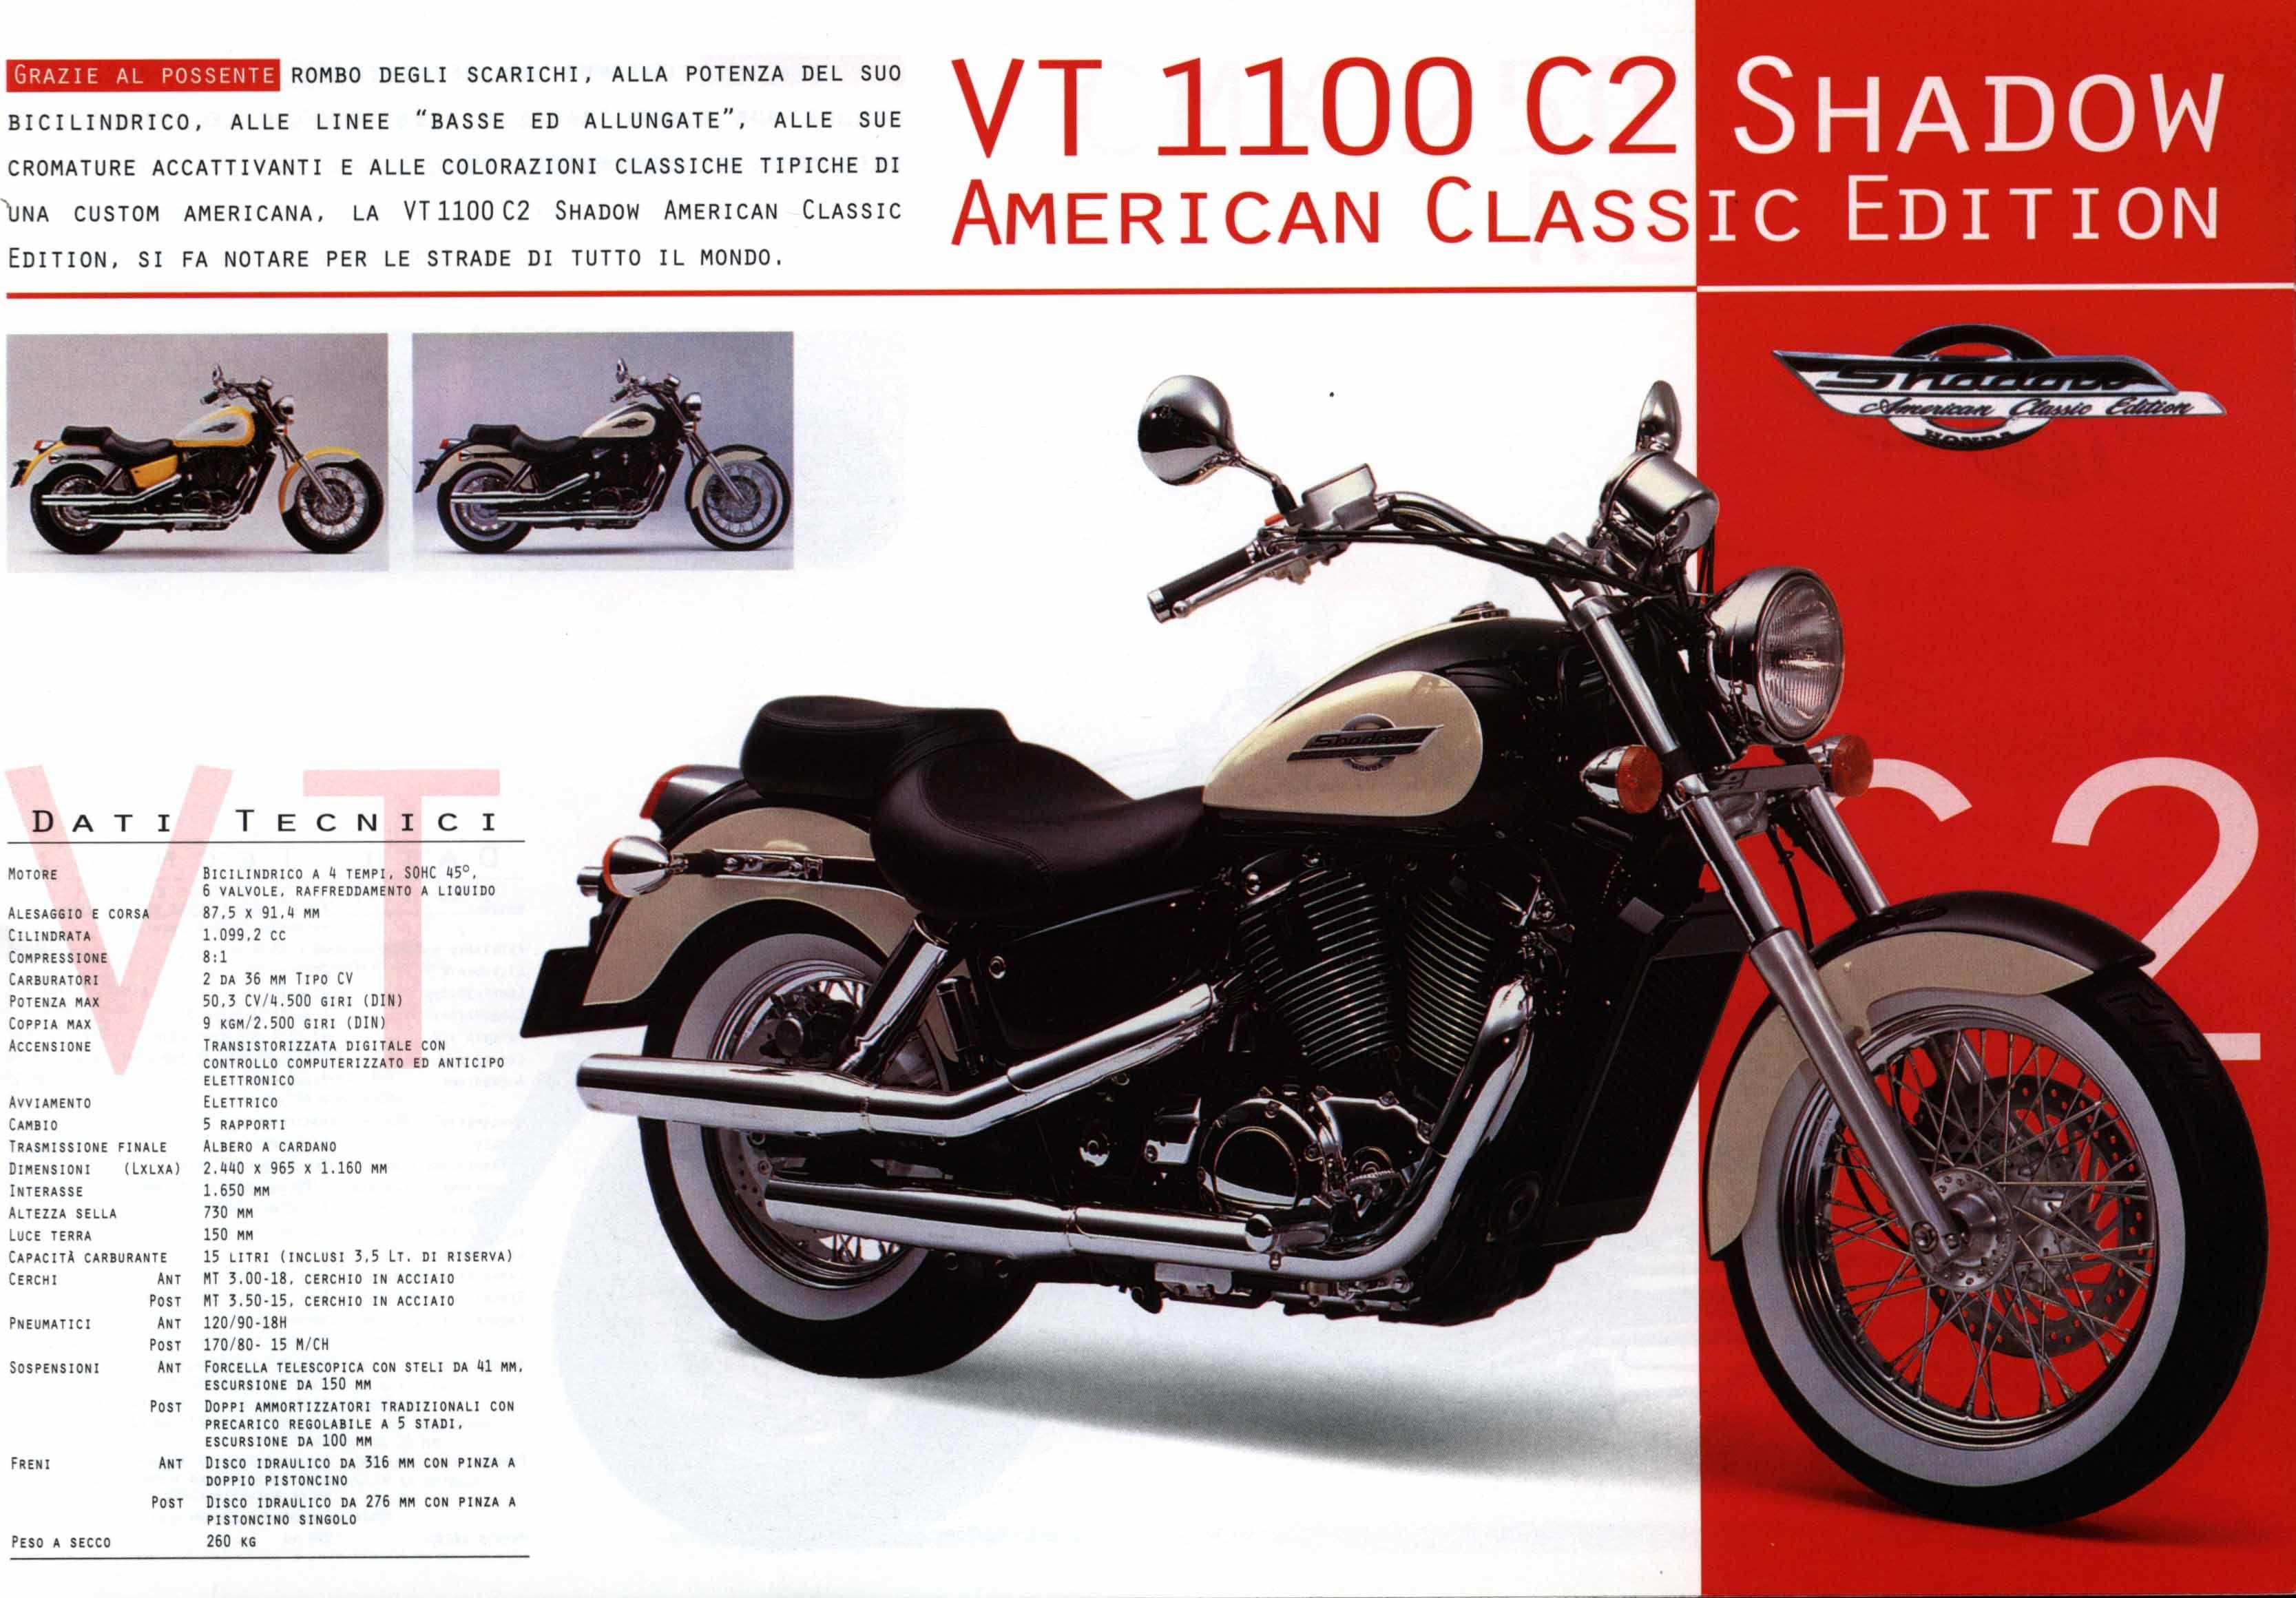 small resolution of honda vt1100 c2 shadow american classic edition brochure